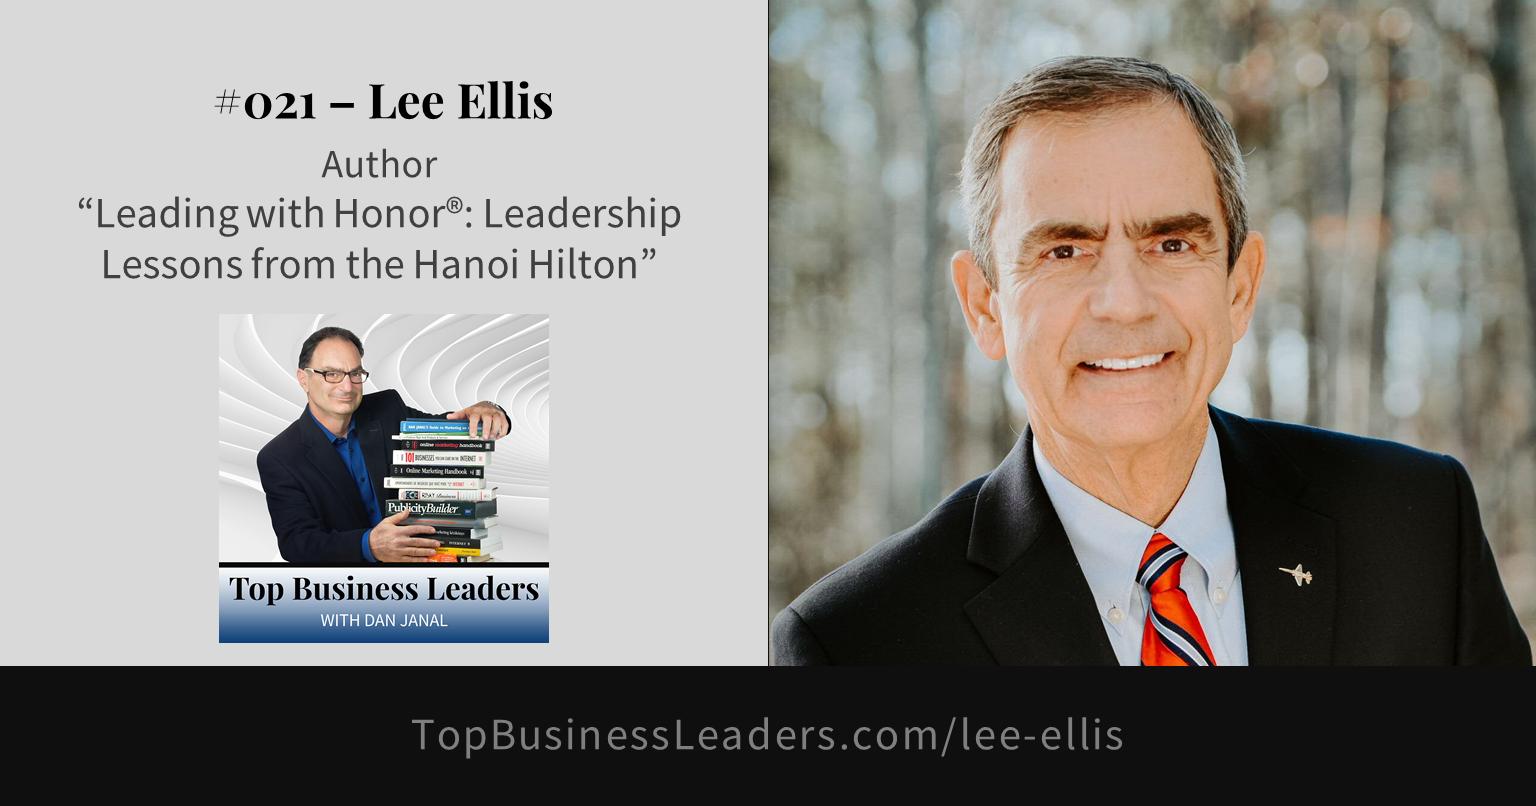 lee-ellis-author-leading-with-honor-leadership-lessons-hanoi-hilton